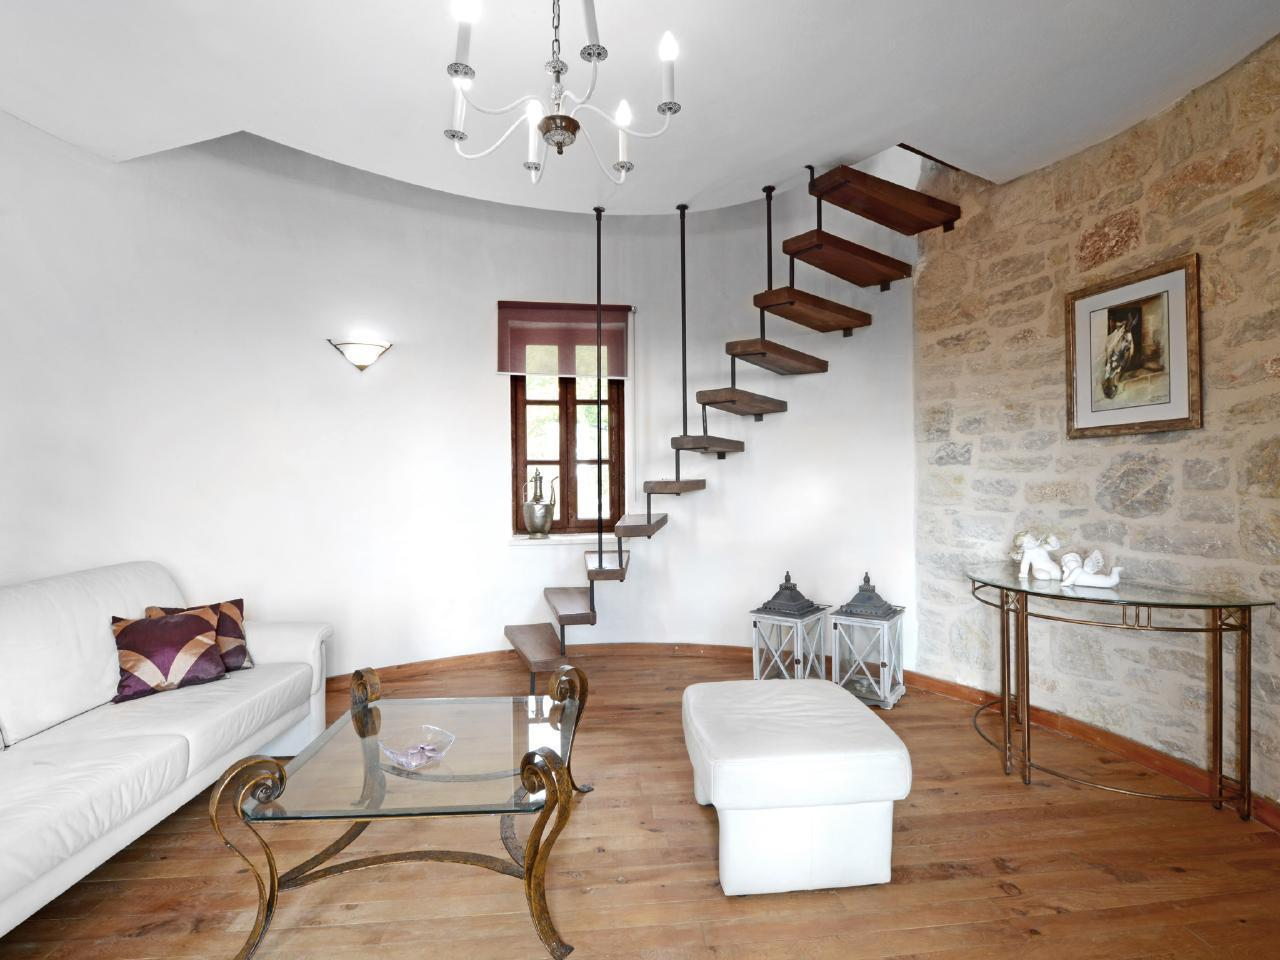 Maison de vacances Exklusives Chalet, romantisch am Berghang und Meer gelegen (2506674), Mesudiye, , Région Egéenne, Turquie, image 24